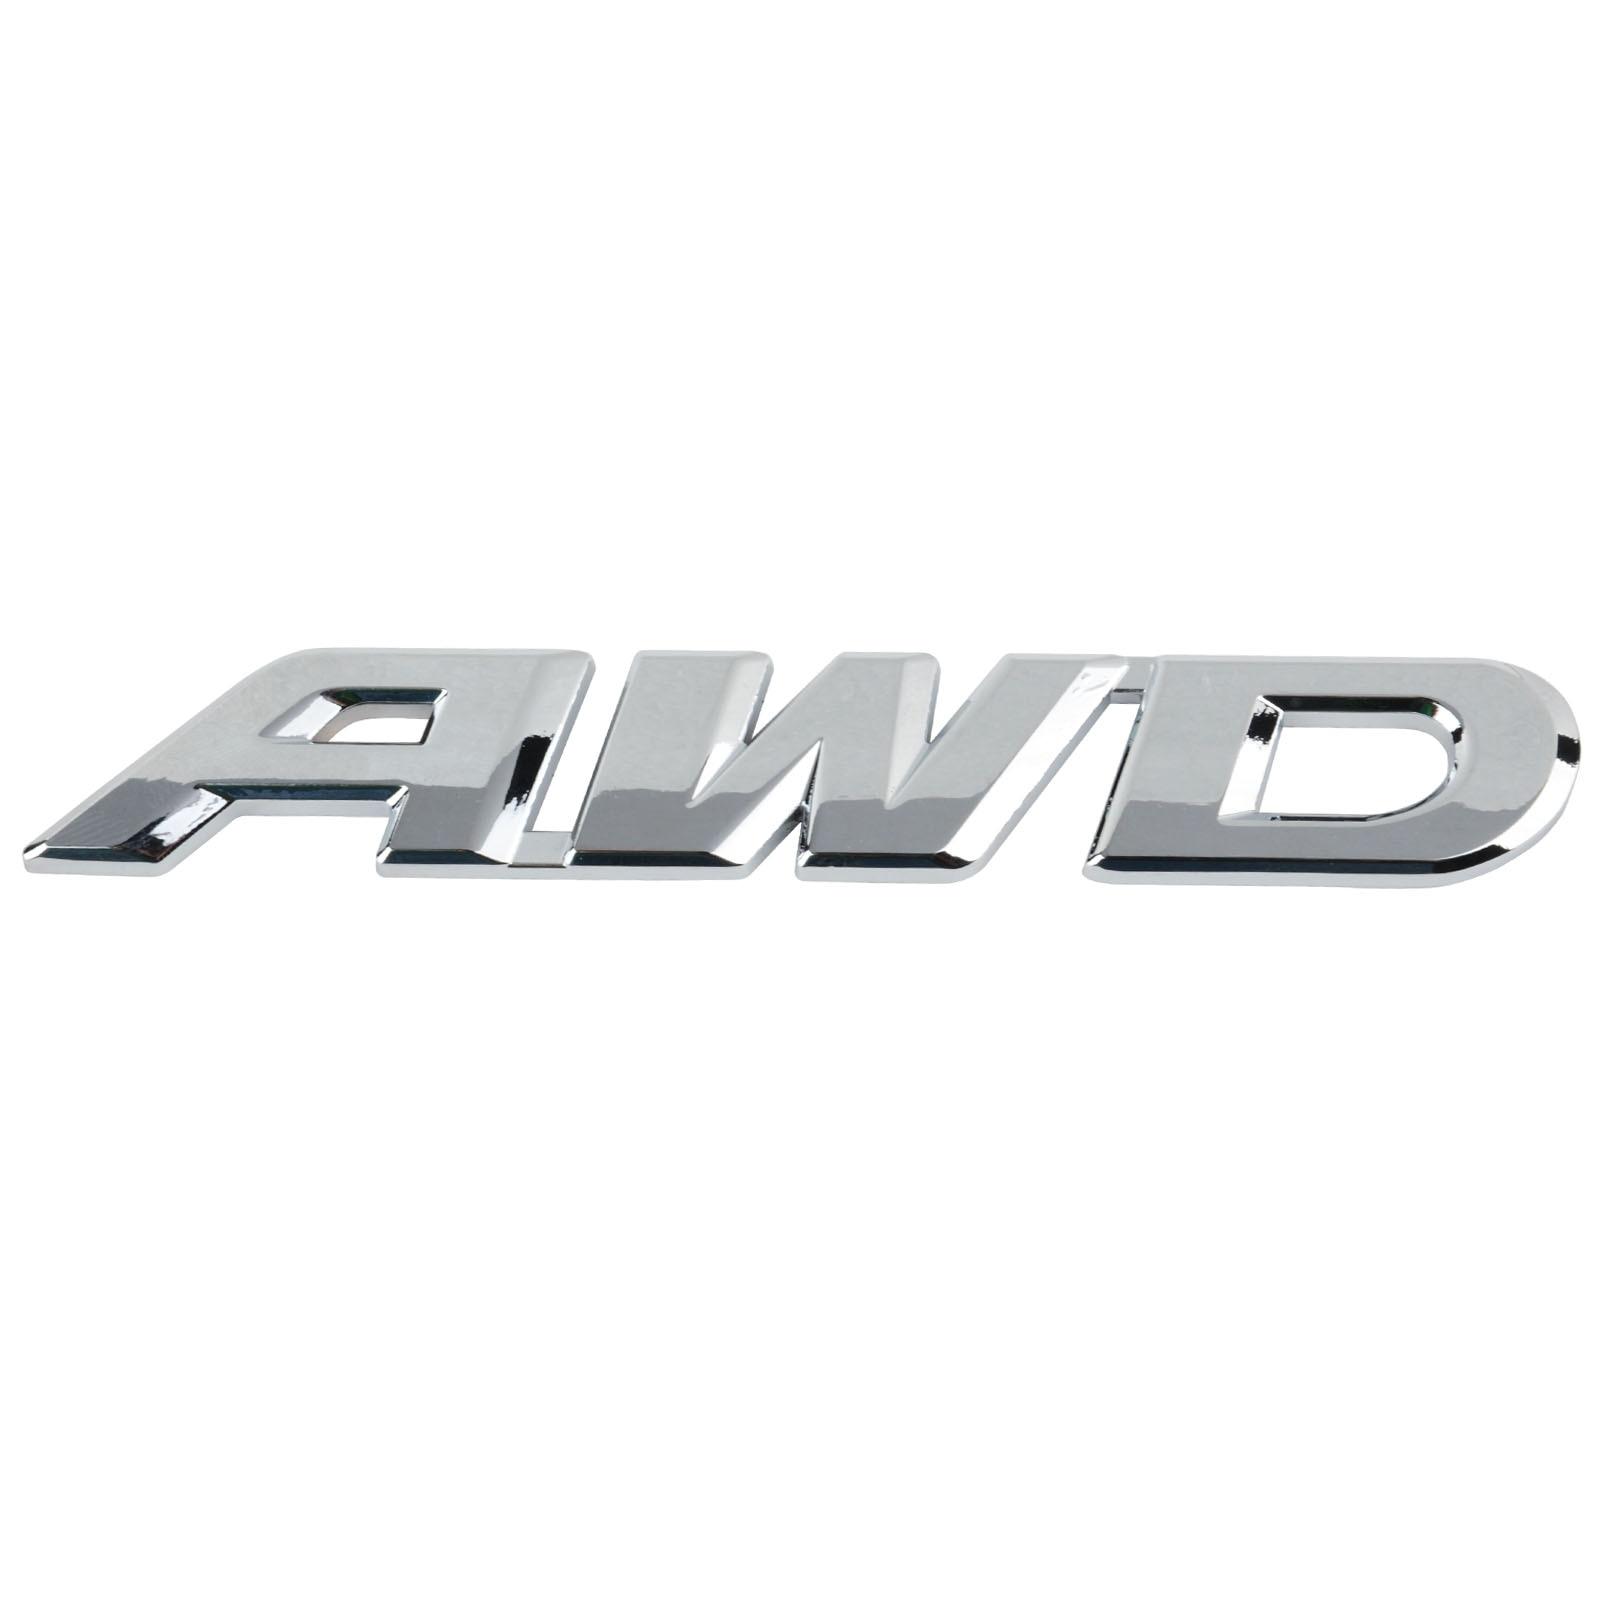 Car Auto SUV Tailgate 4WD Metal Emblem Sticker Badge 4 Wheel Drive Off Road Red